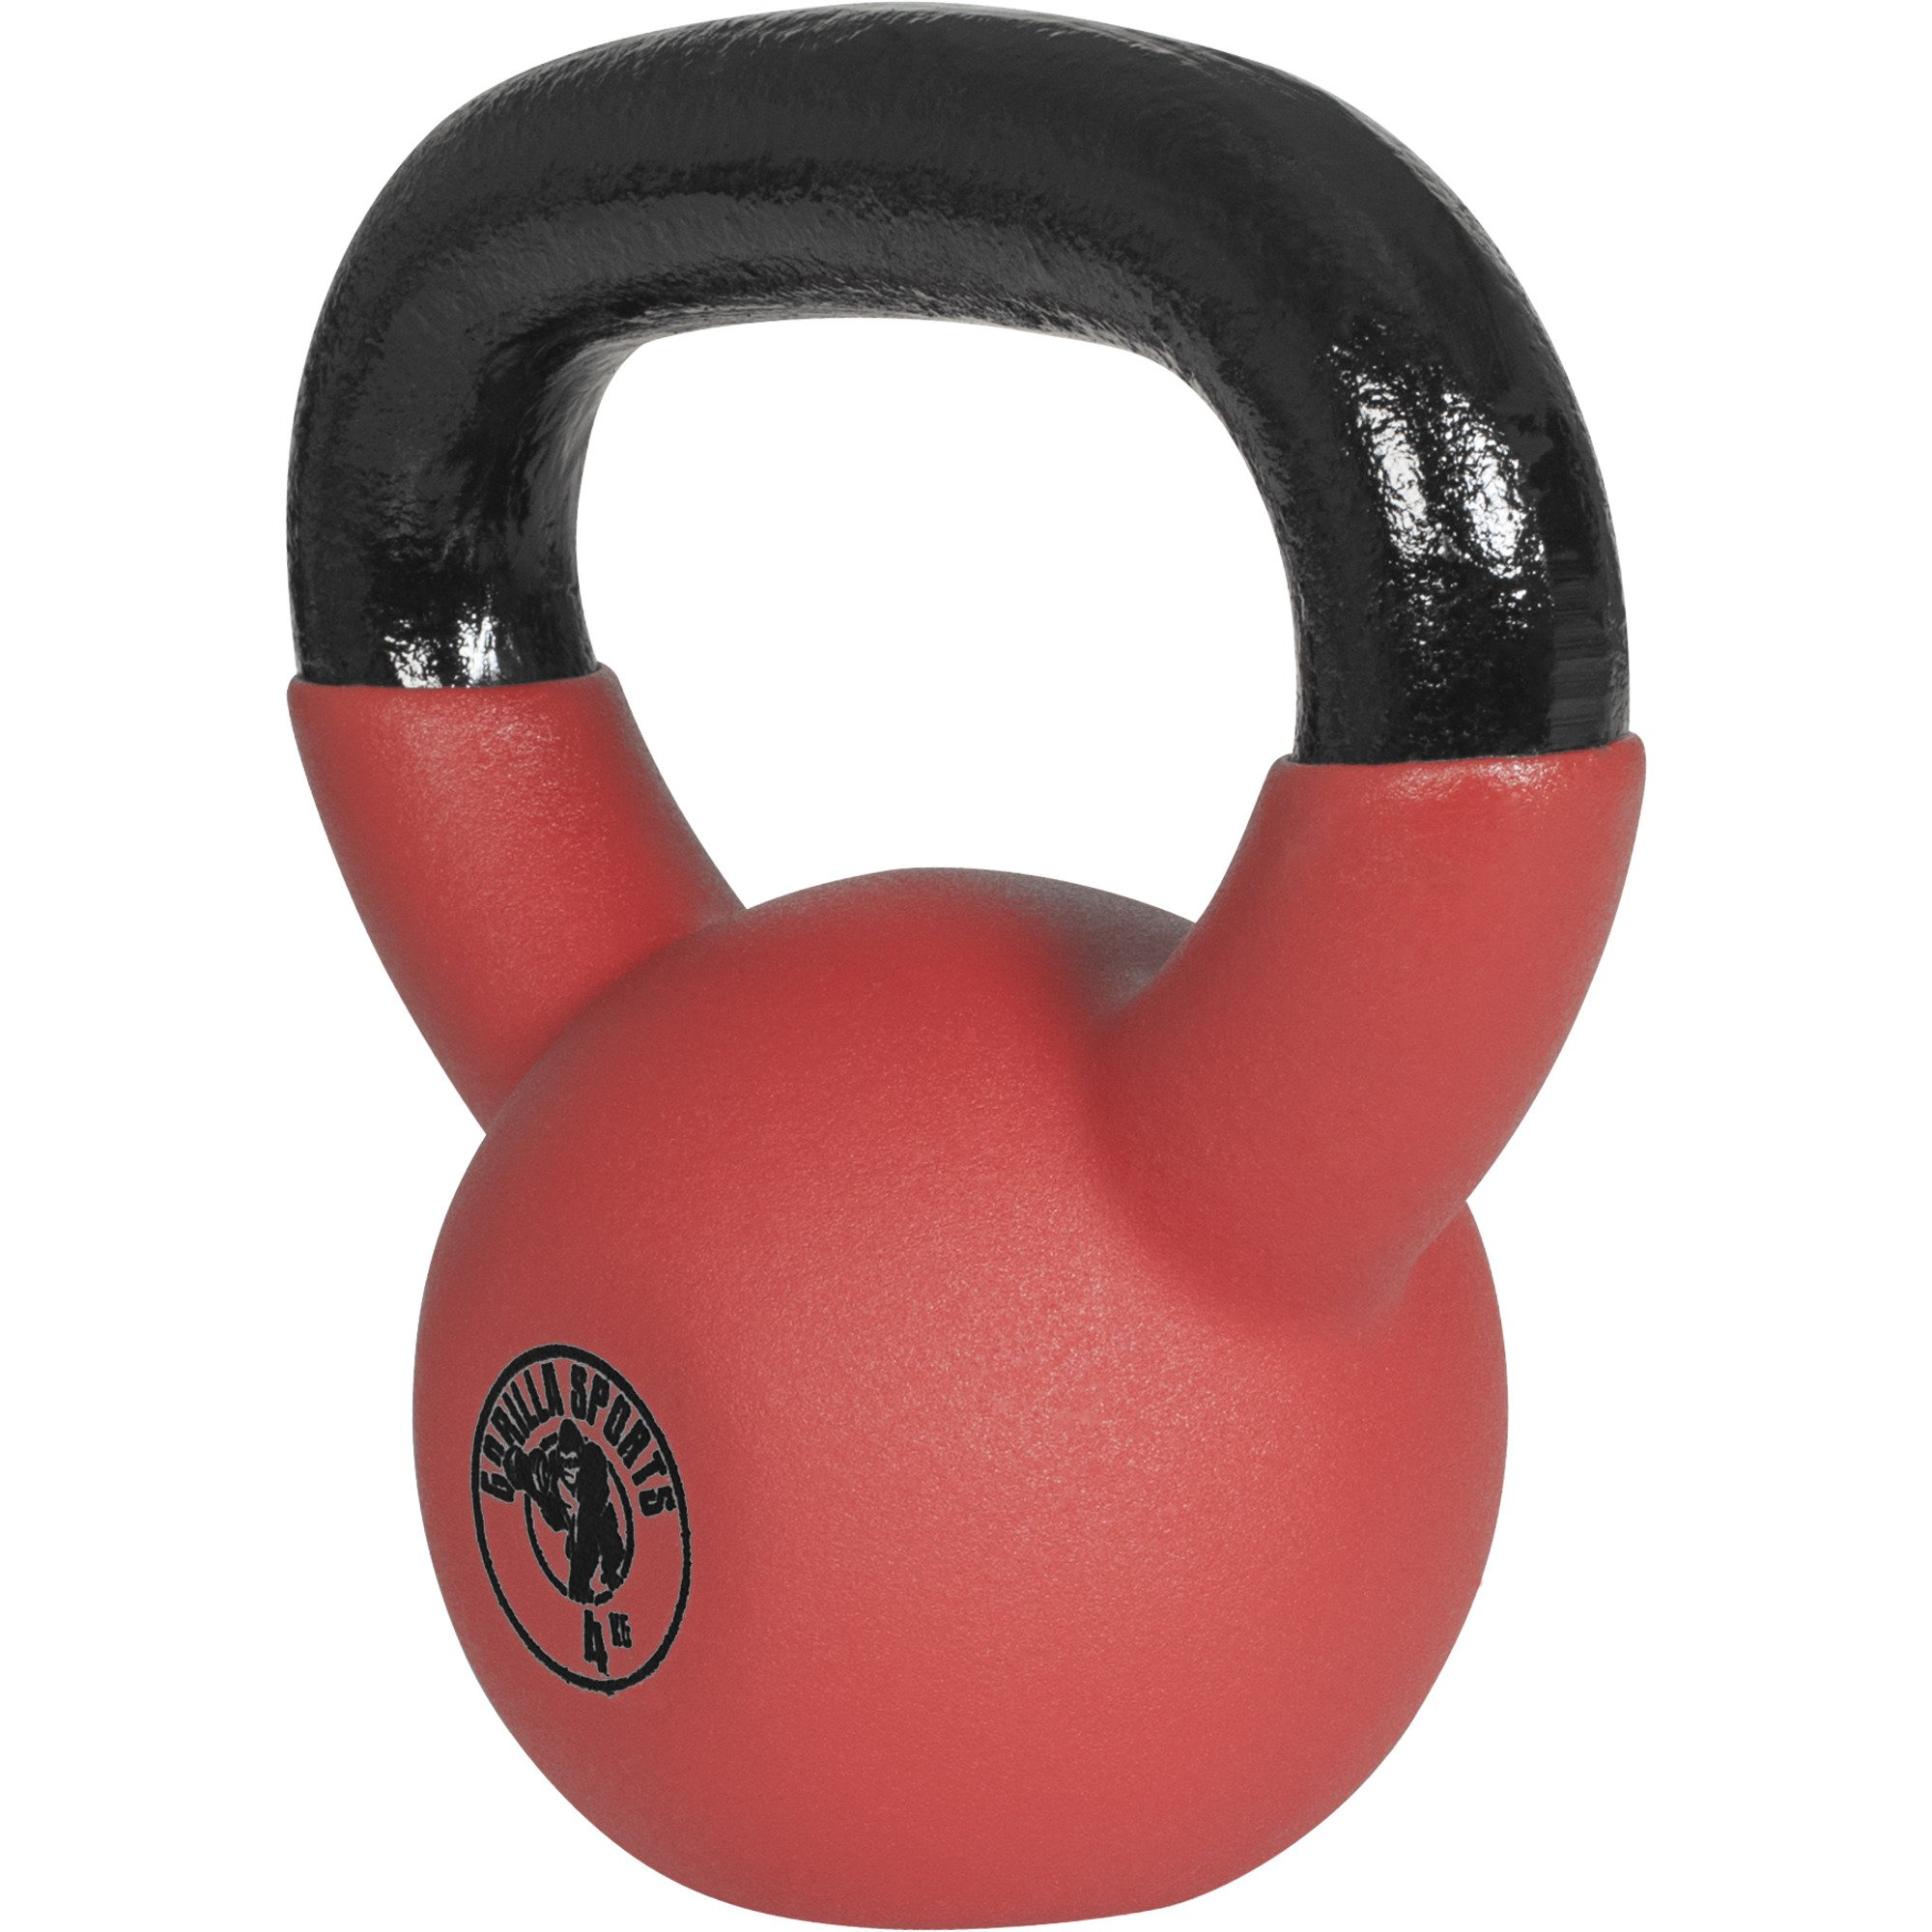 Gorilla Sports Red Rubber Kettlebell 9 lb - 70 lb (9)